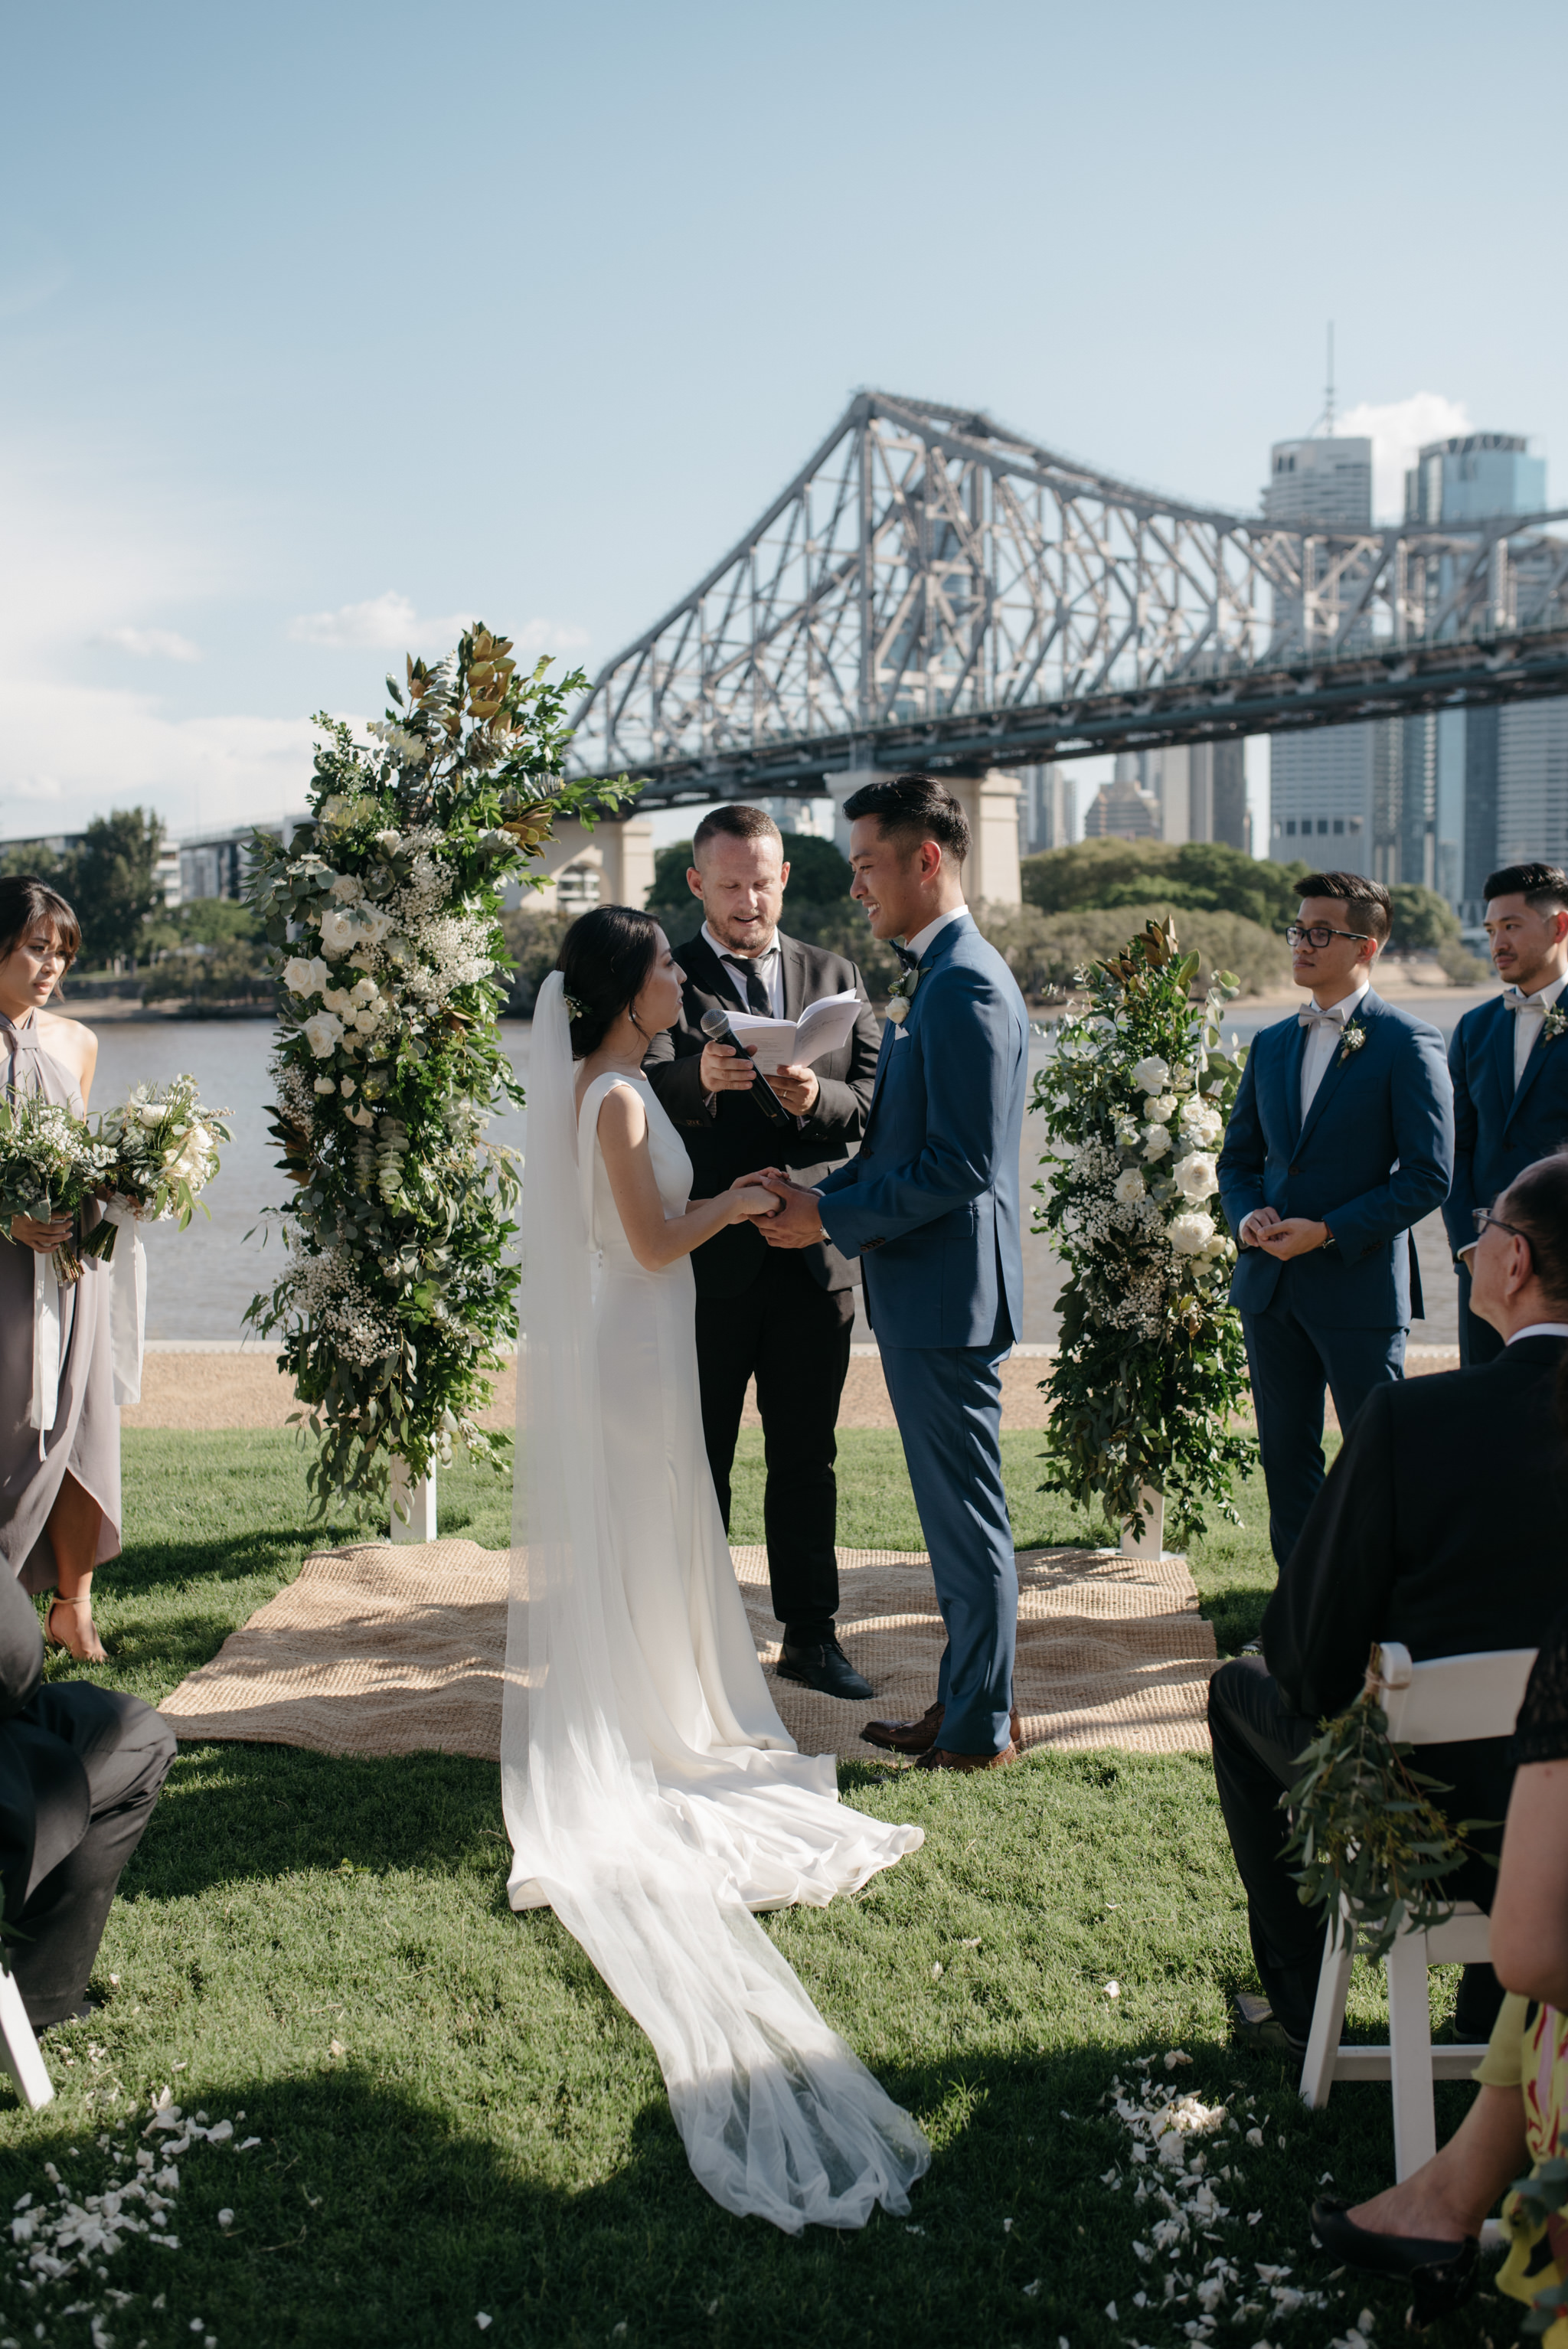 Howard Smith Wharves Wedding ceremony, Ephemeral Creative